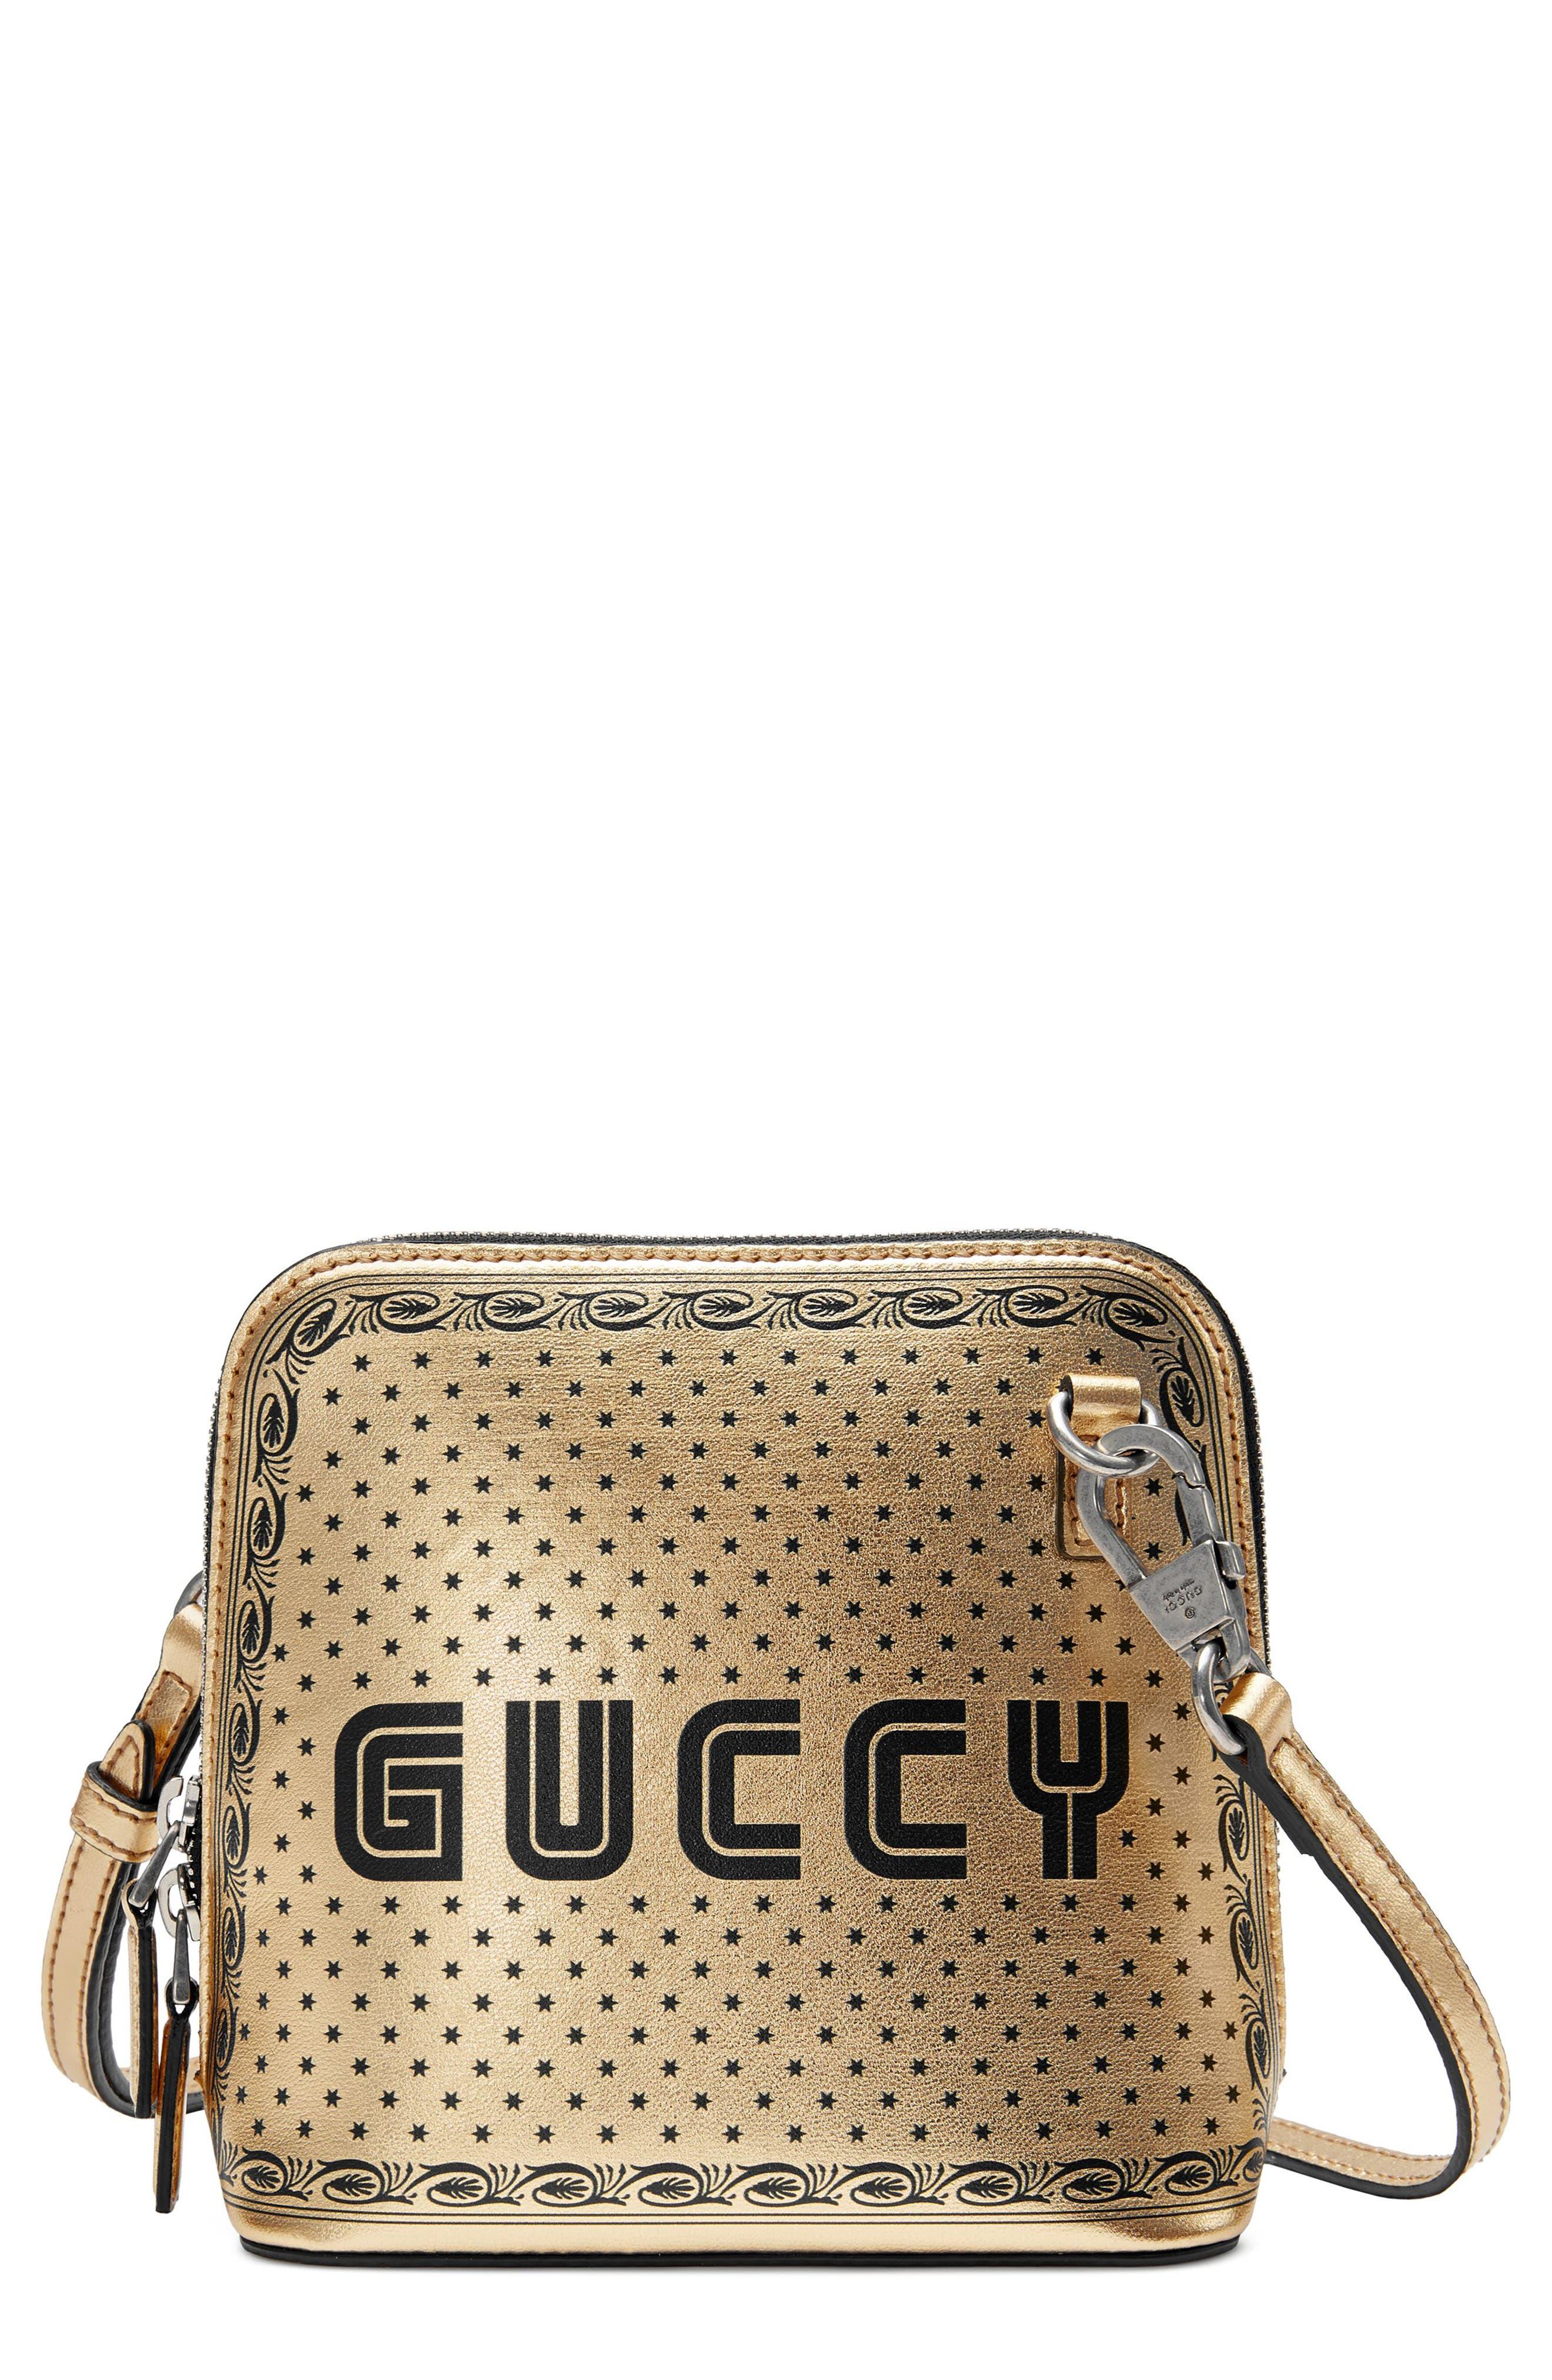 Guccy Logo Moon & Stars Leather Crossbody Bag,                             Main thumbnail 1, color,                             ORO/ NERO